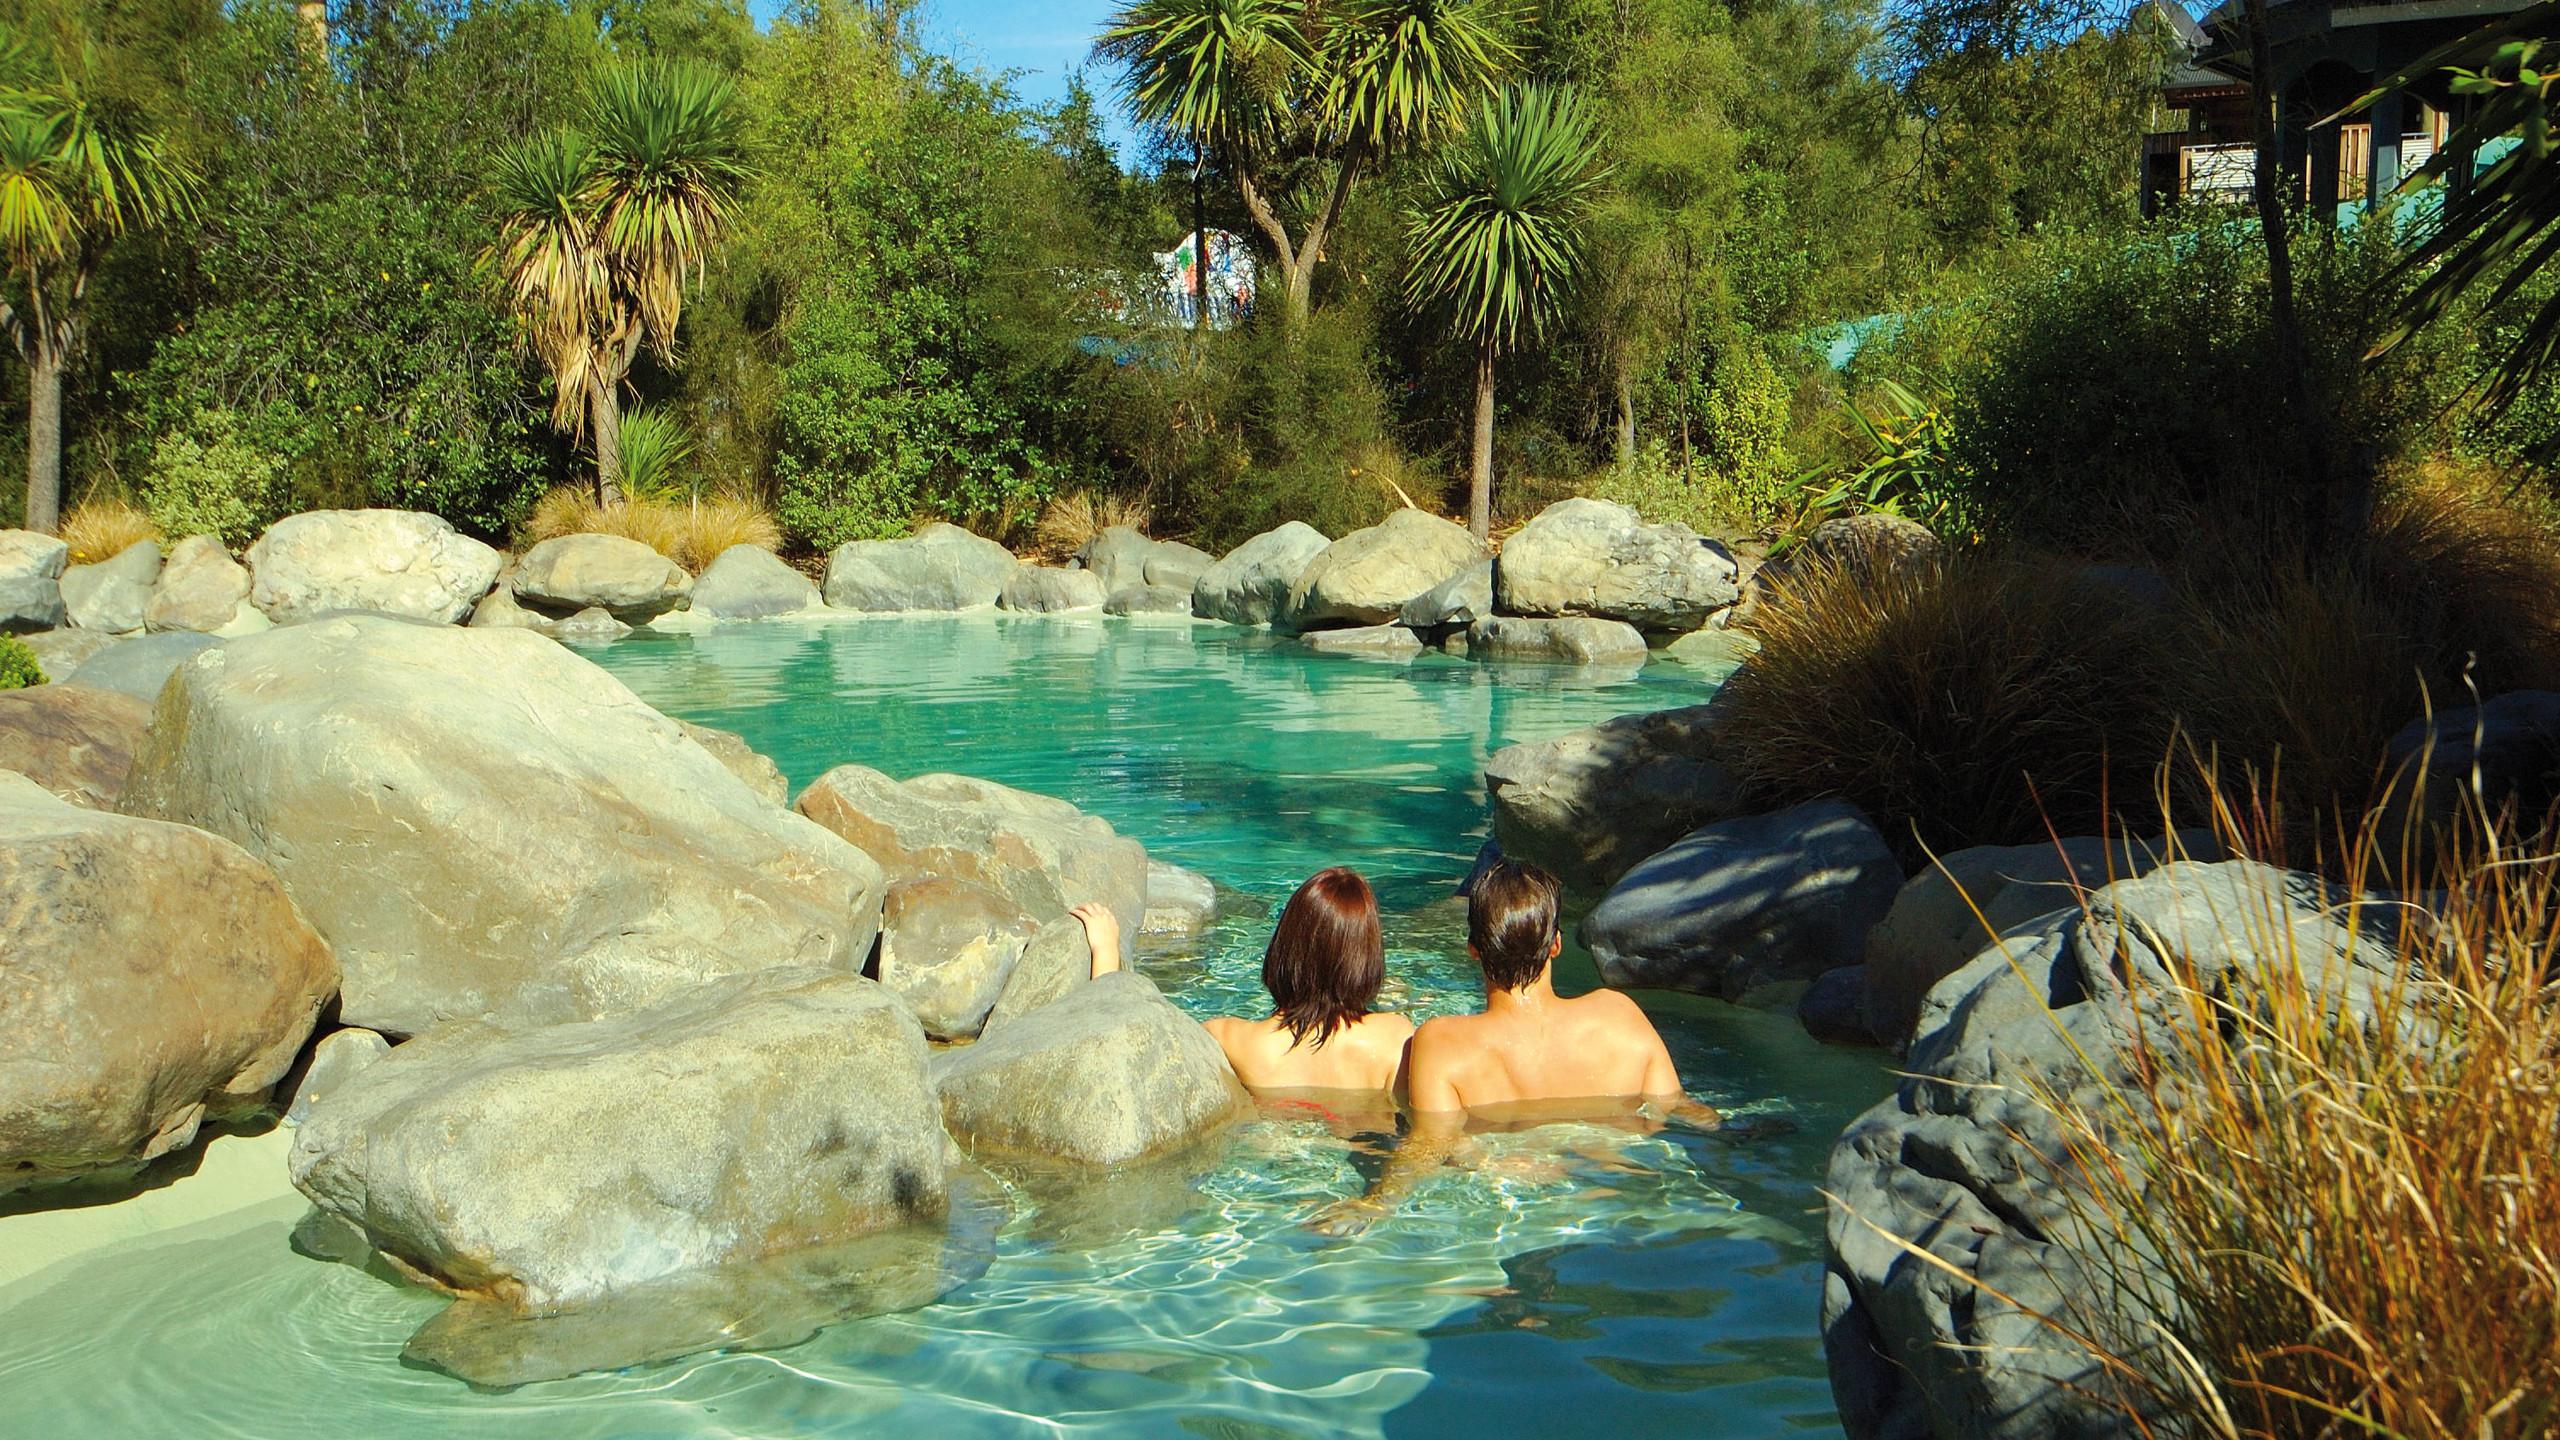 Hot springs Hanmer Springs New Zealand